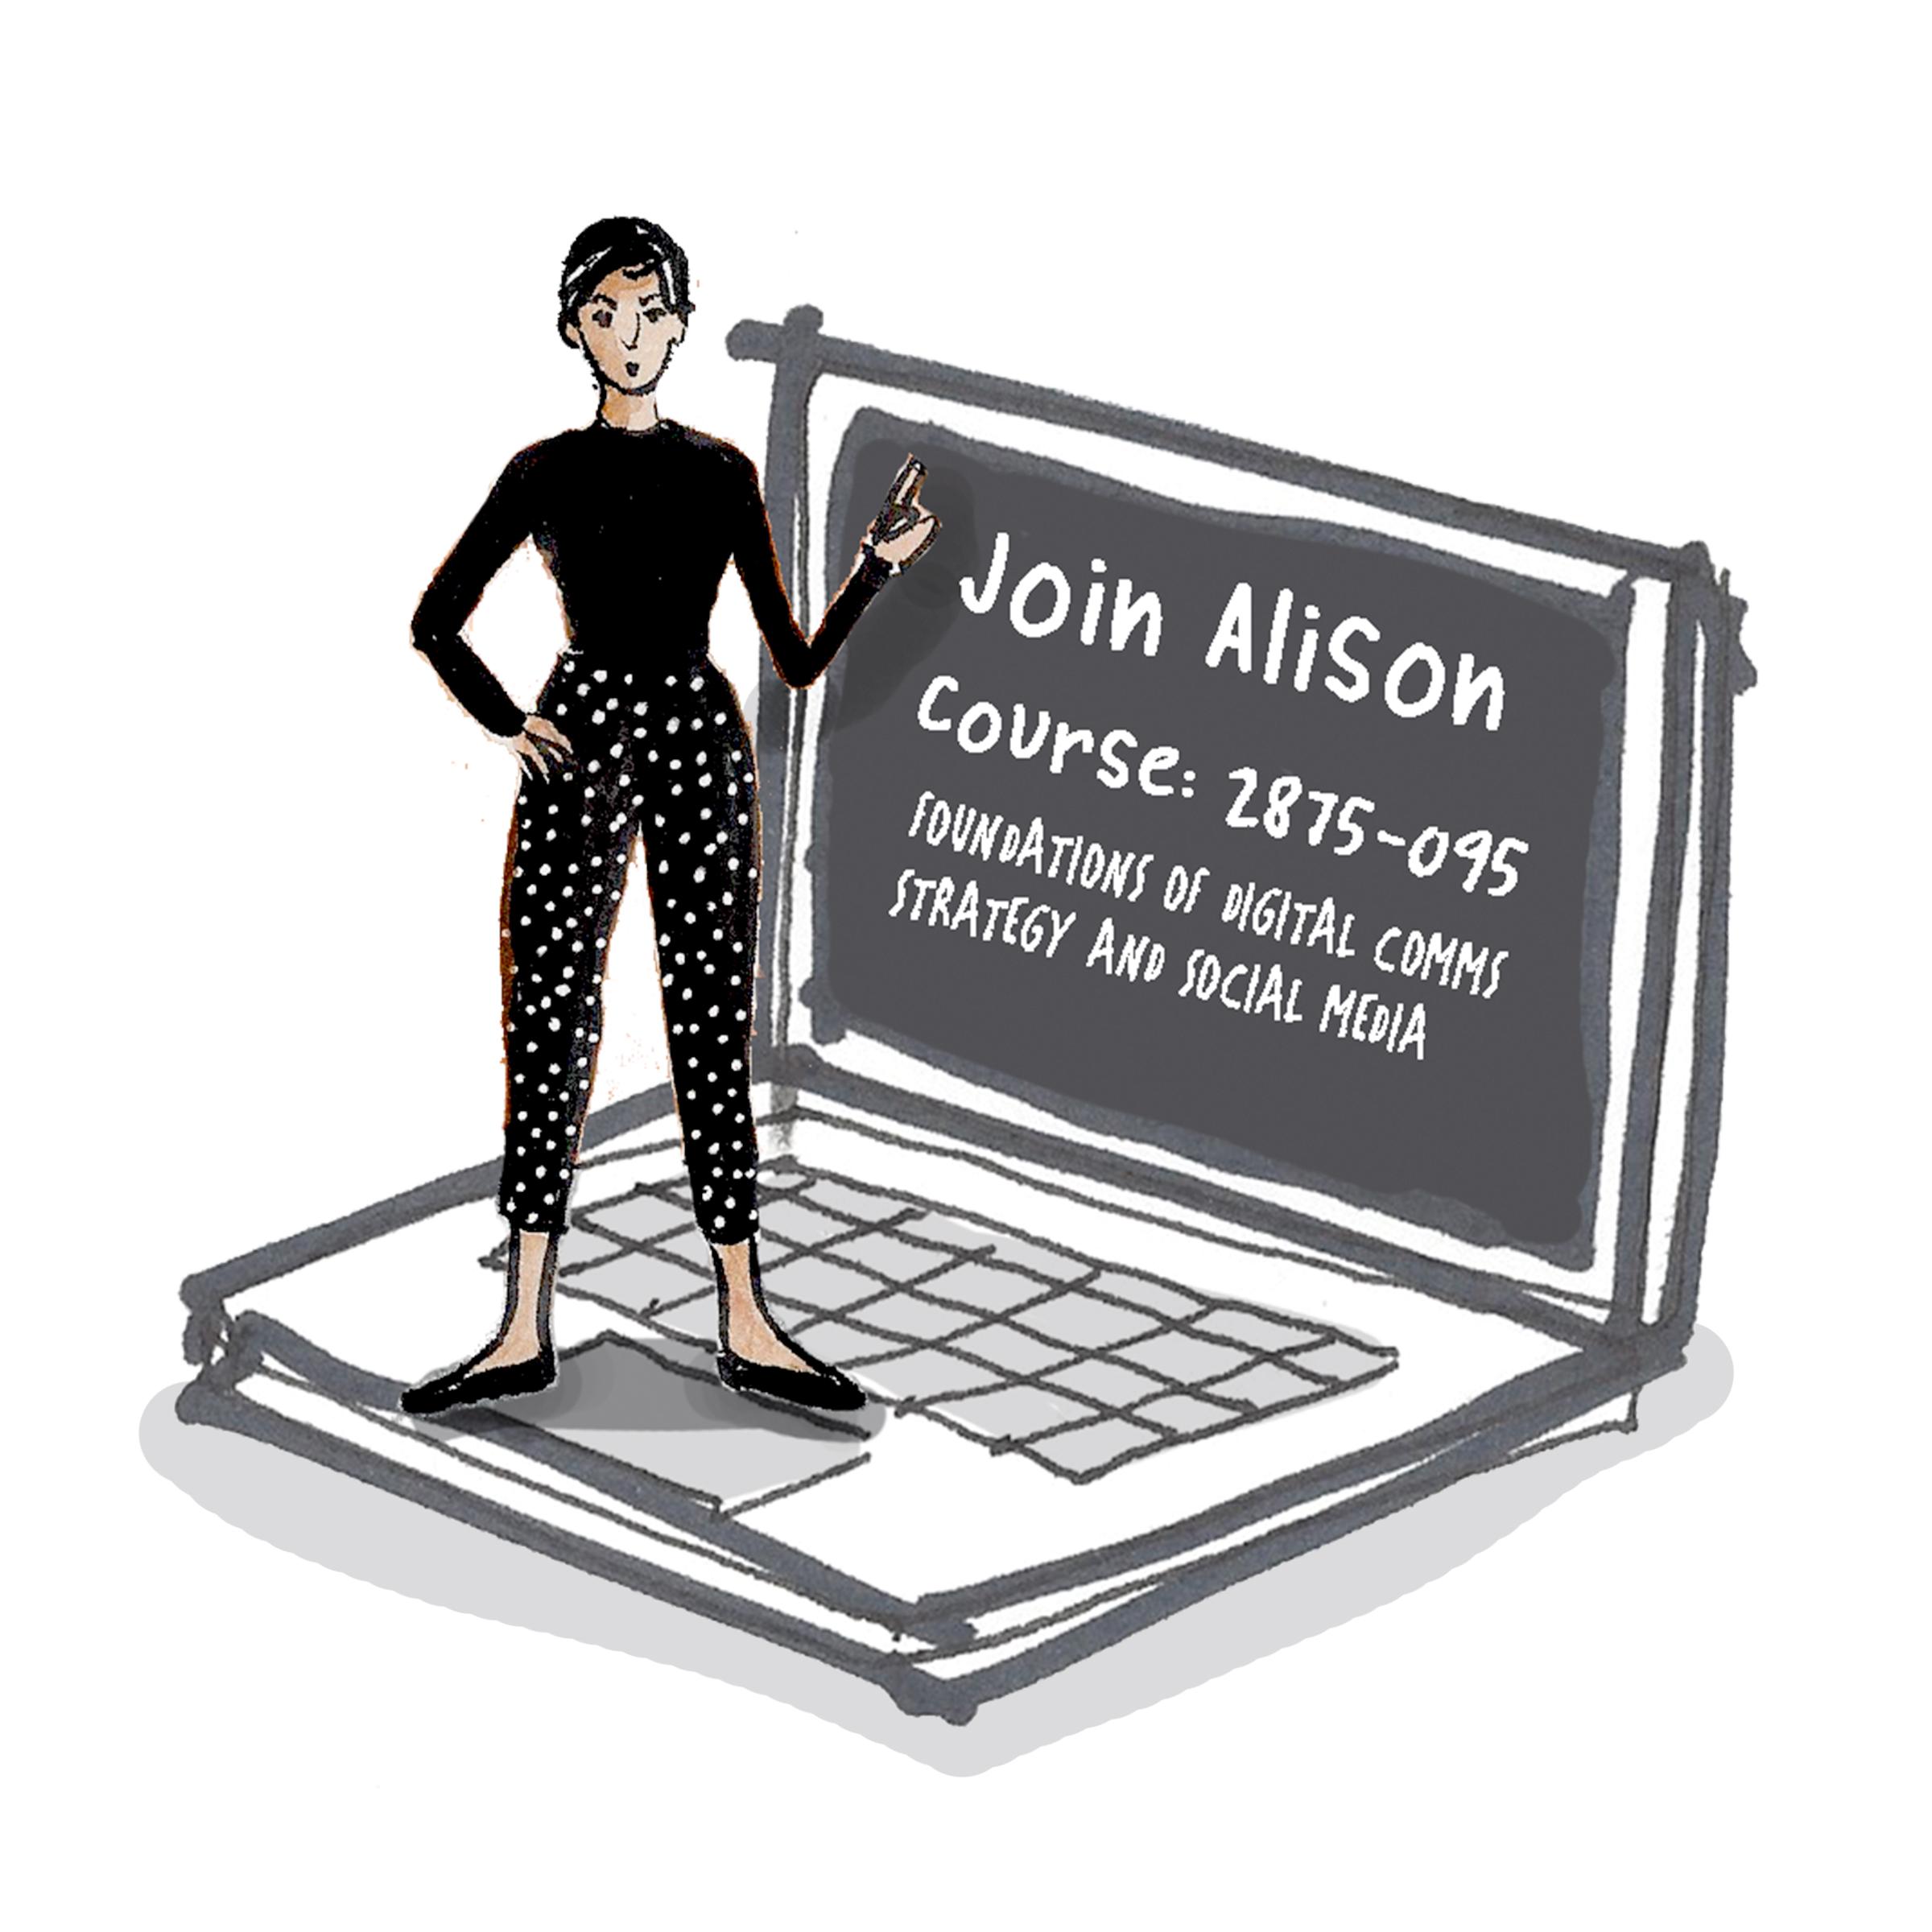 Alison Garwood-Jones instructor